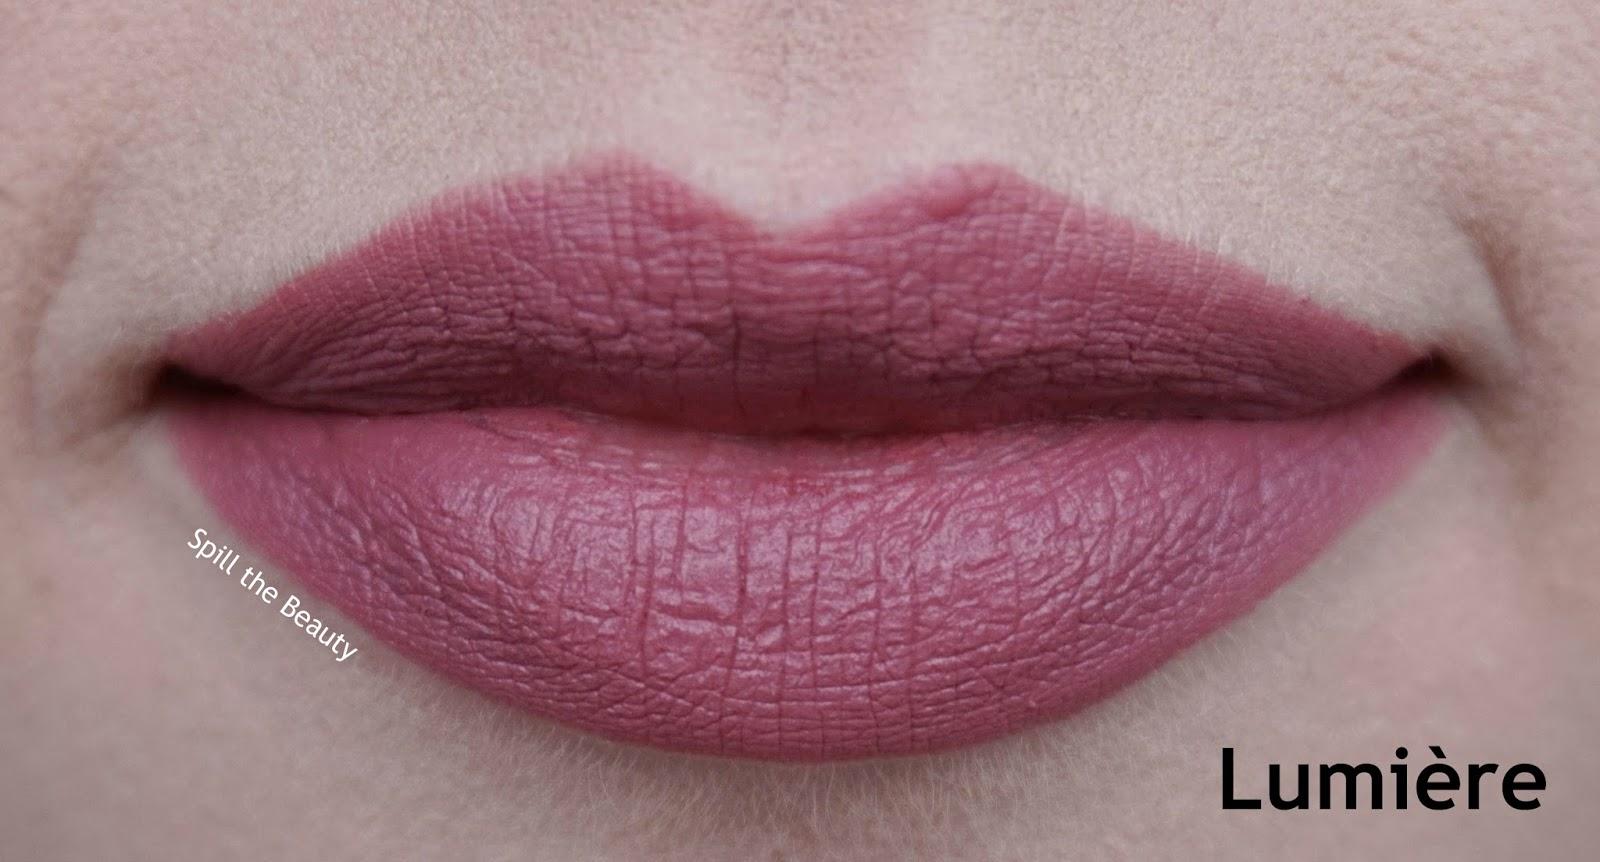 colourpop lippie stix review swatches 4 lumiere - lips